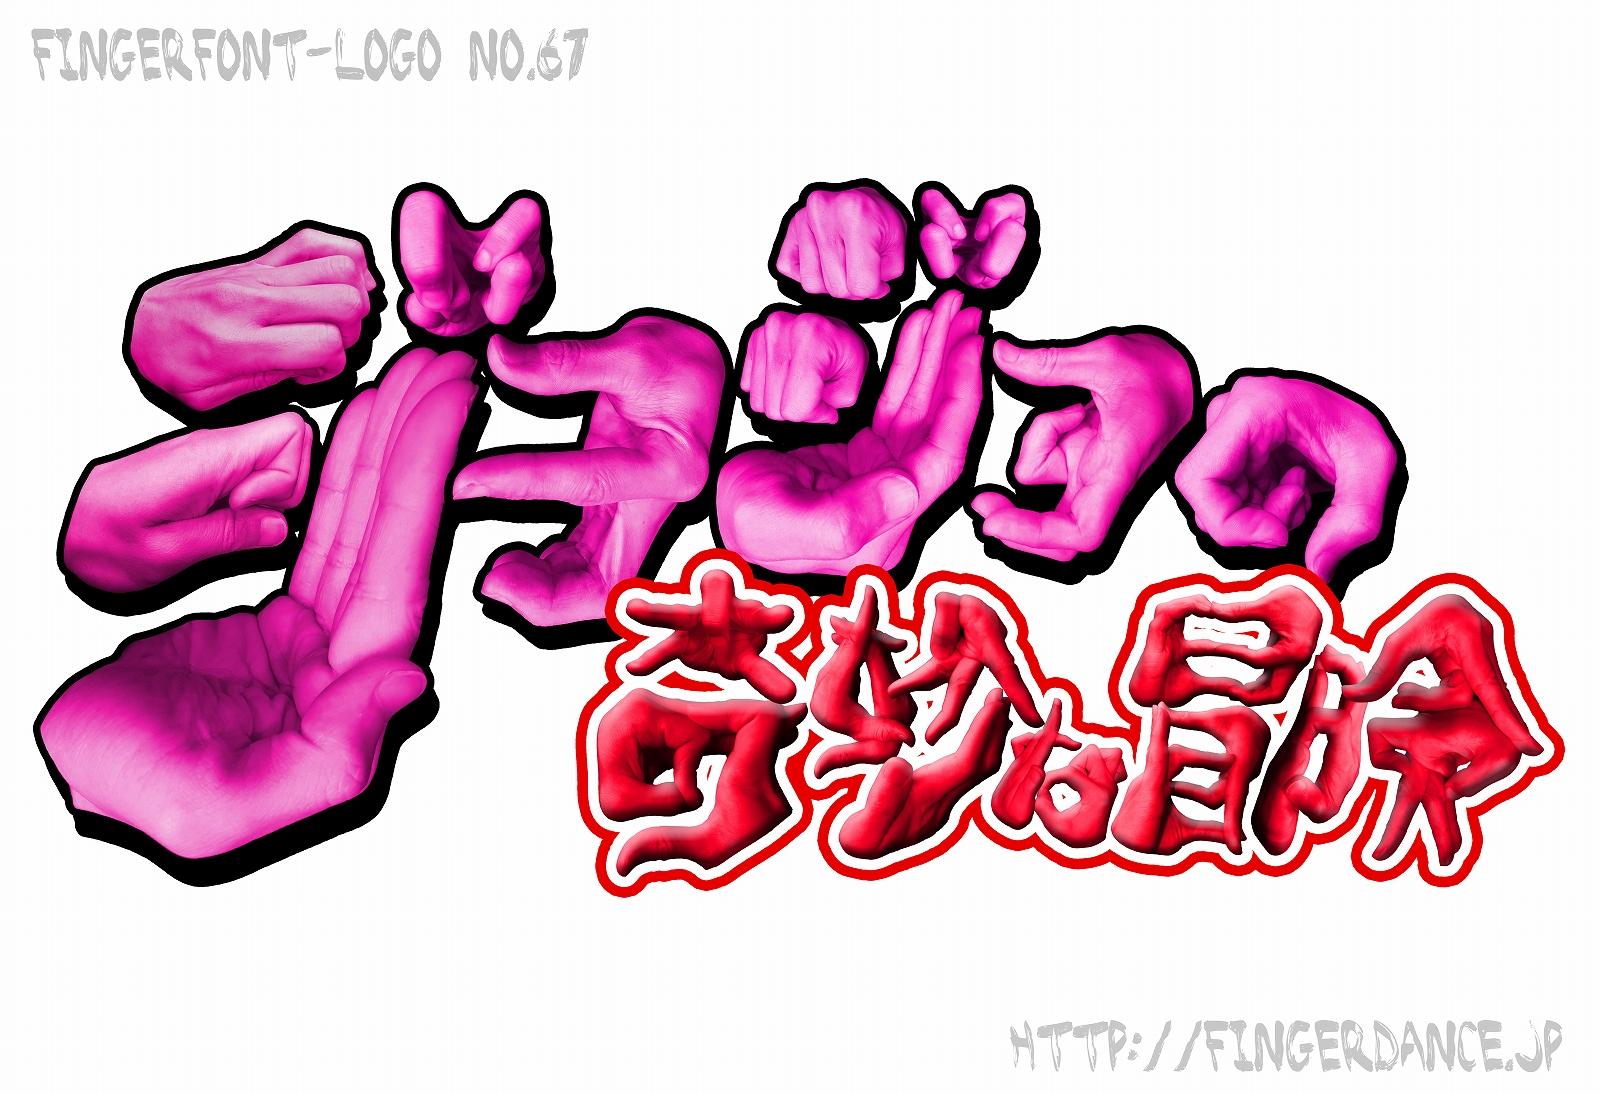 JOJO-fingerlogohand ジョジョの奇妙な冒険フィンガーロゴハンド手指